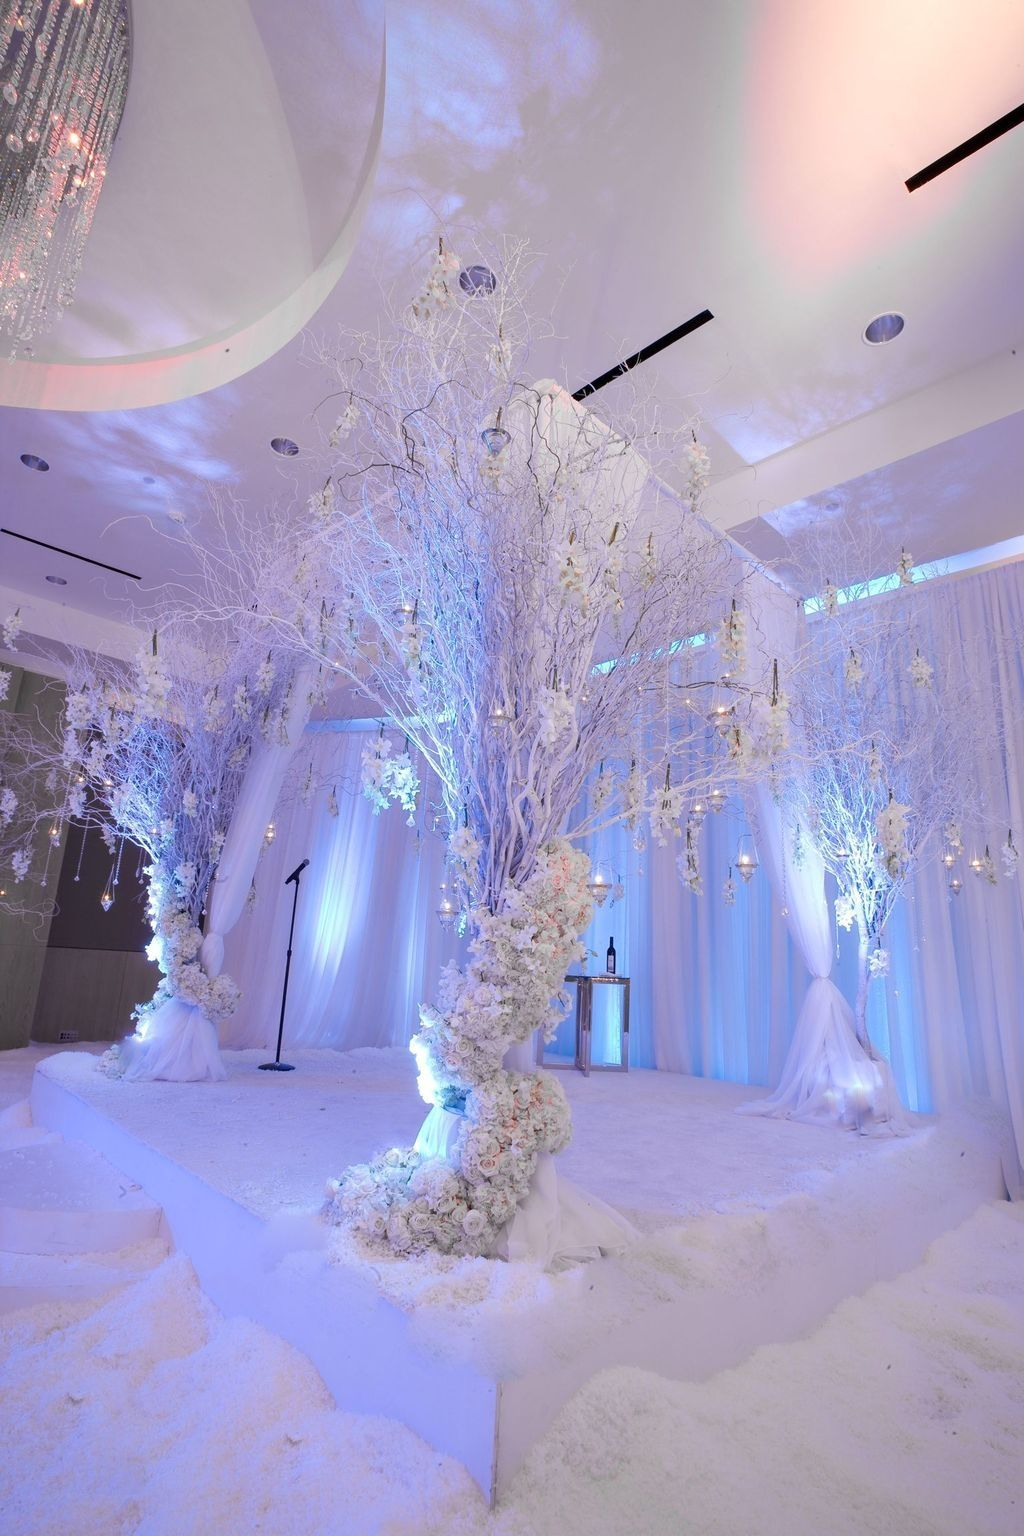 Pin By Christina Ricks On Winter Wonderland Theme Winter Wonderland Wedding Theme Wedding Themes Winter Winter Wedding Decorations